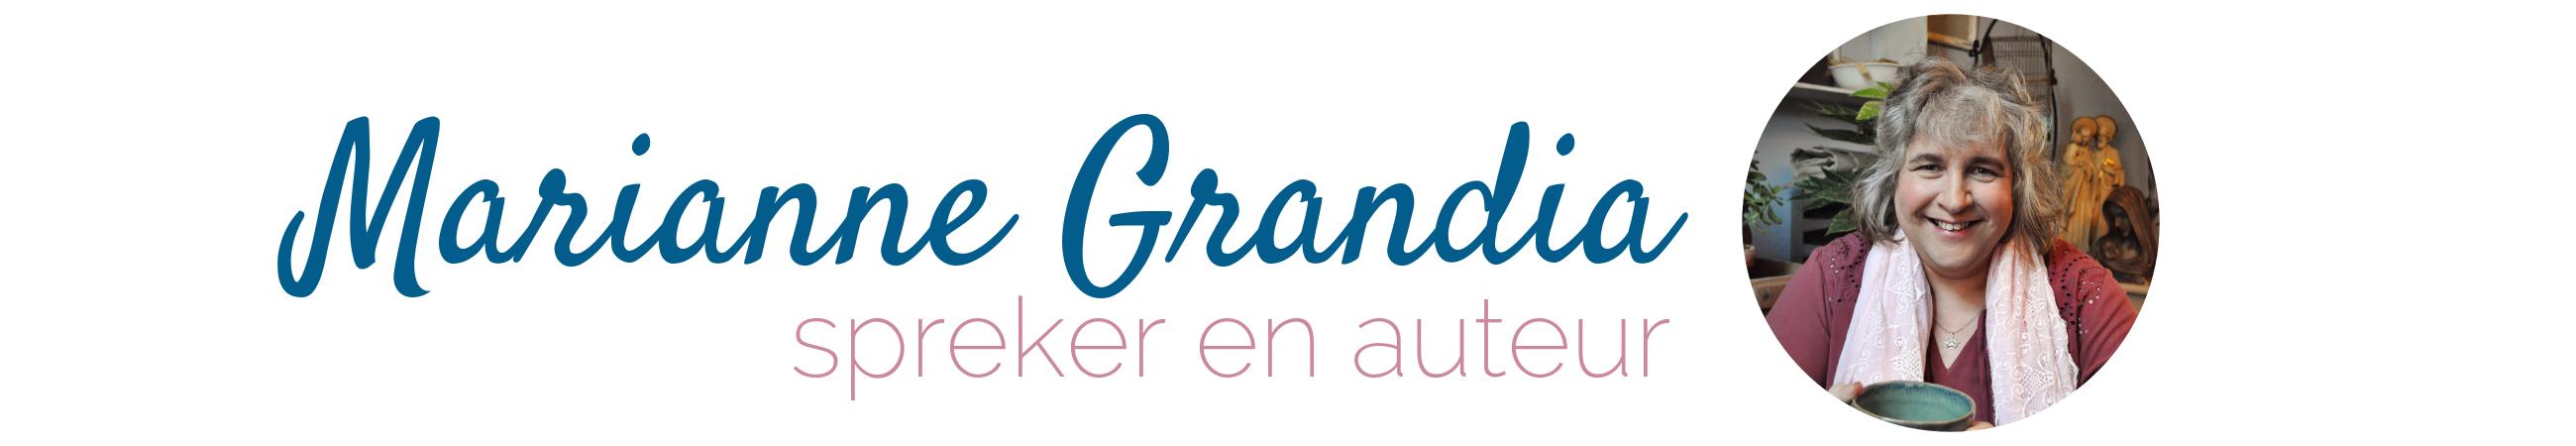 Marianne Grandia